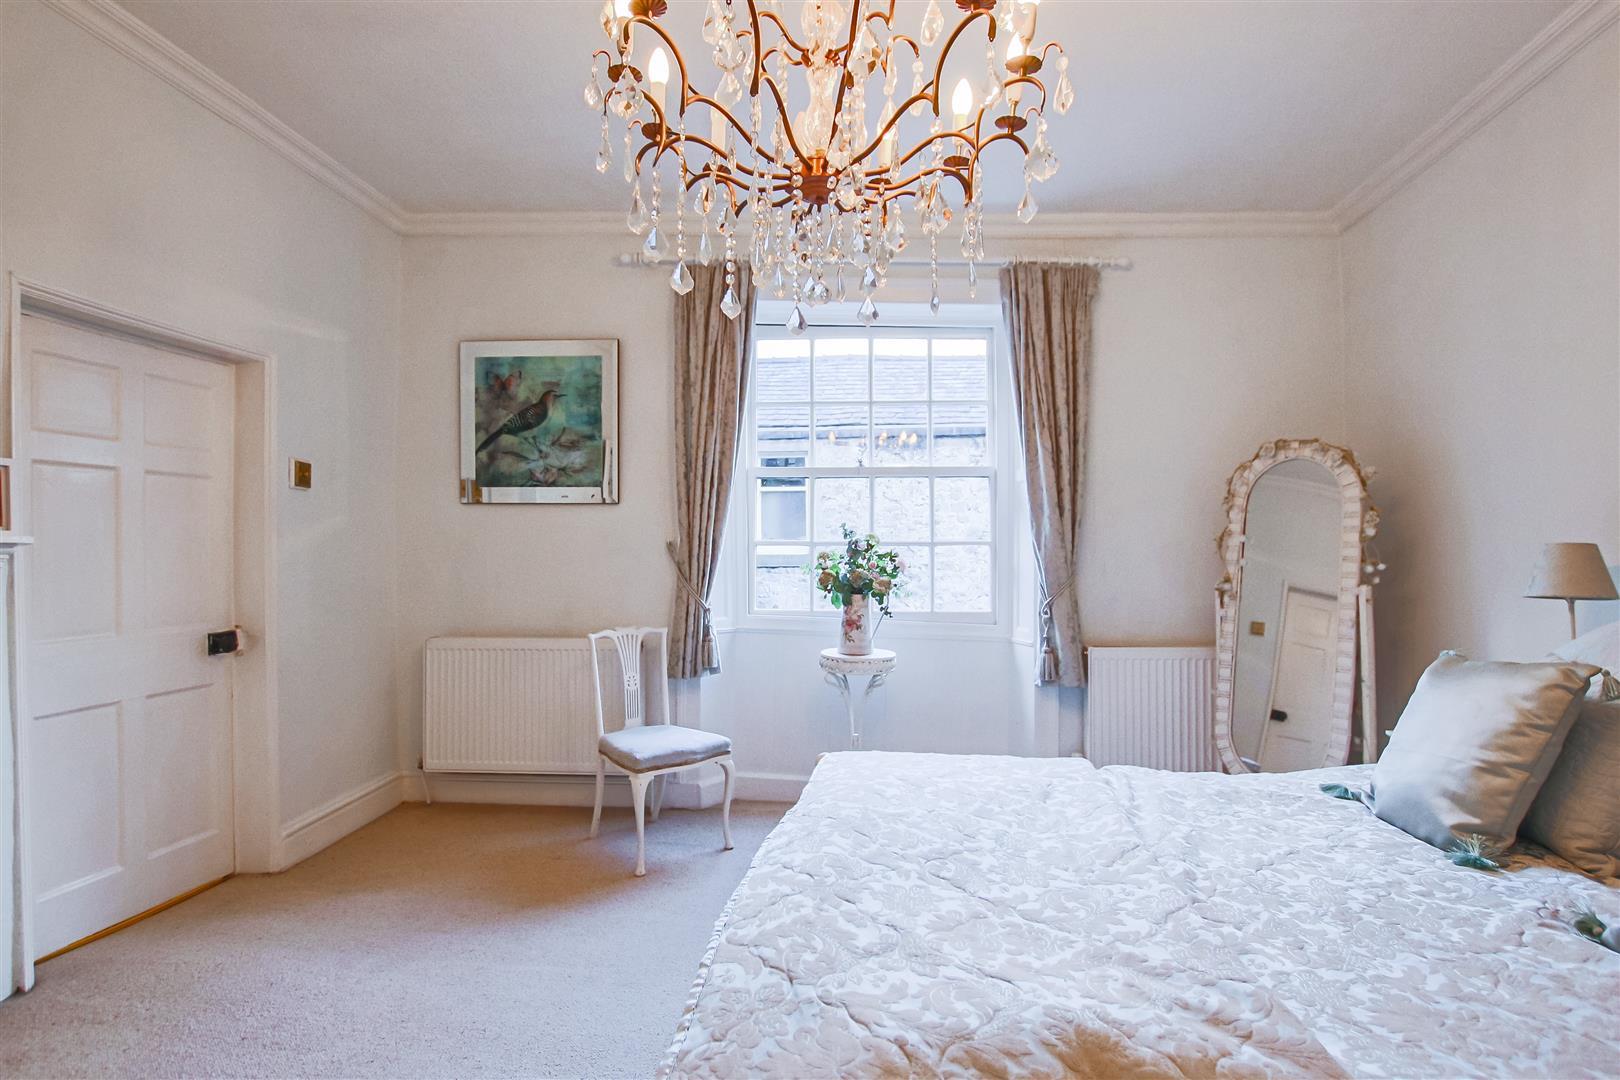 3 Bedroom Semi-detached House For Sale - Main Bedroom